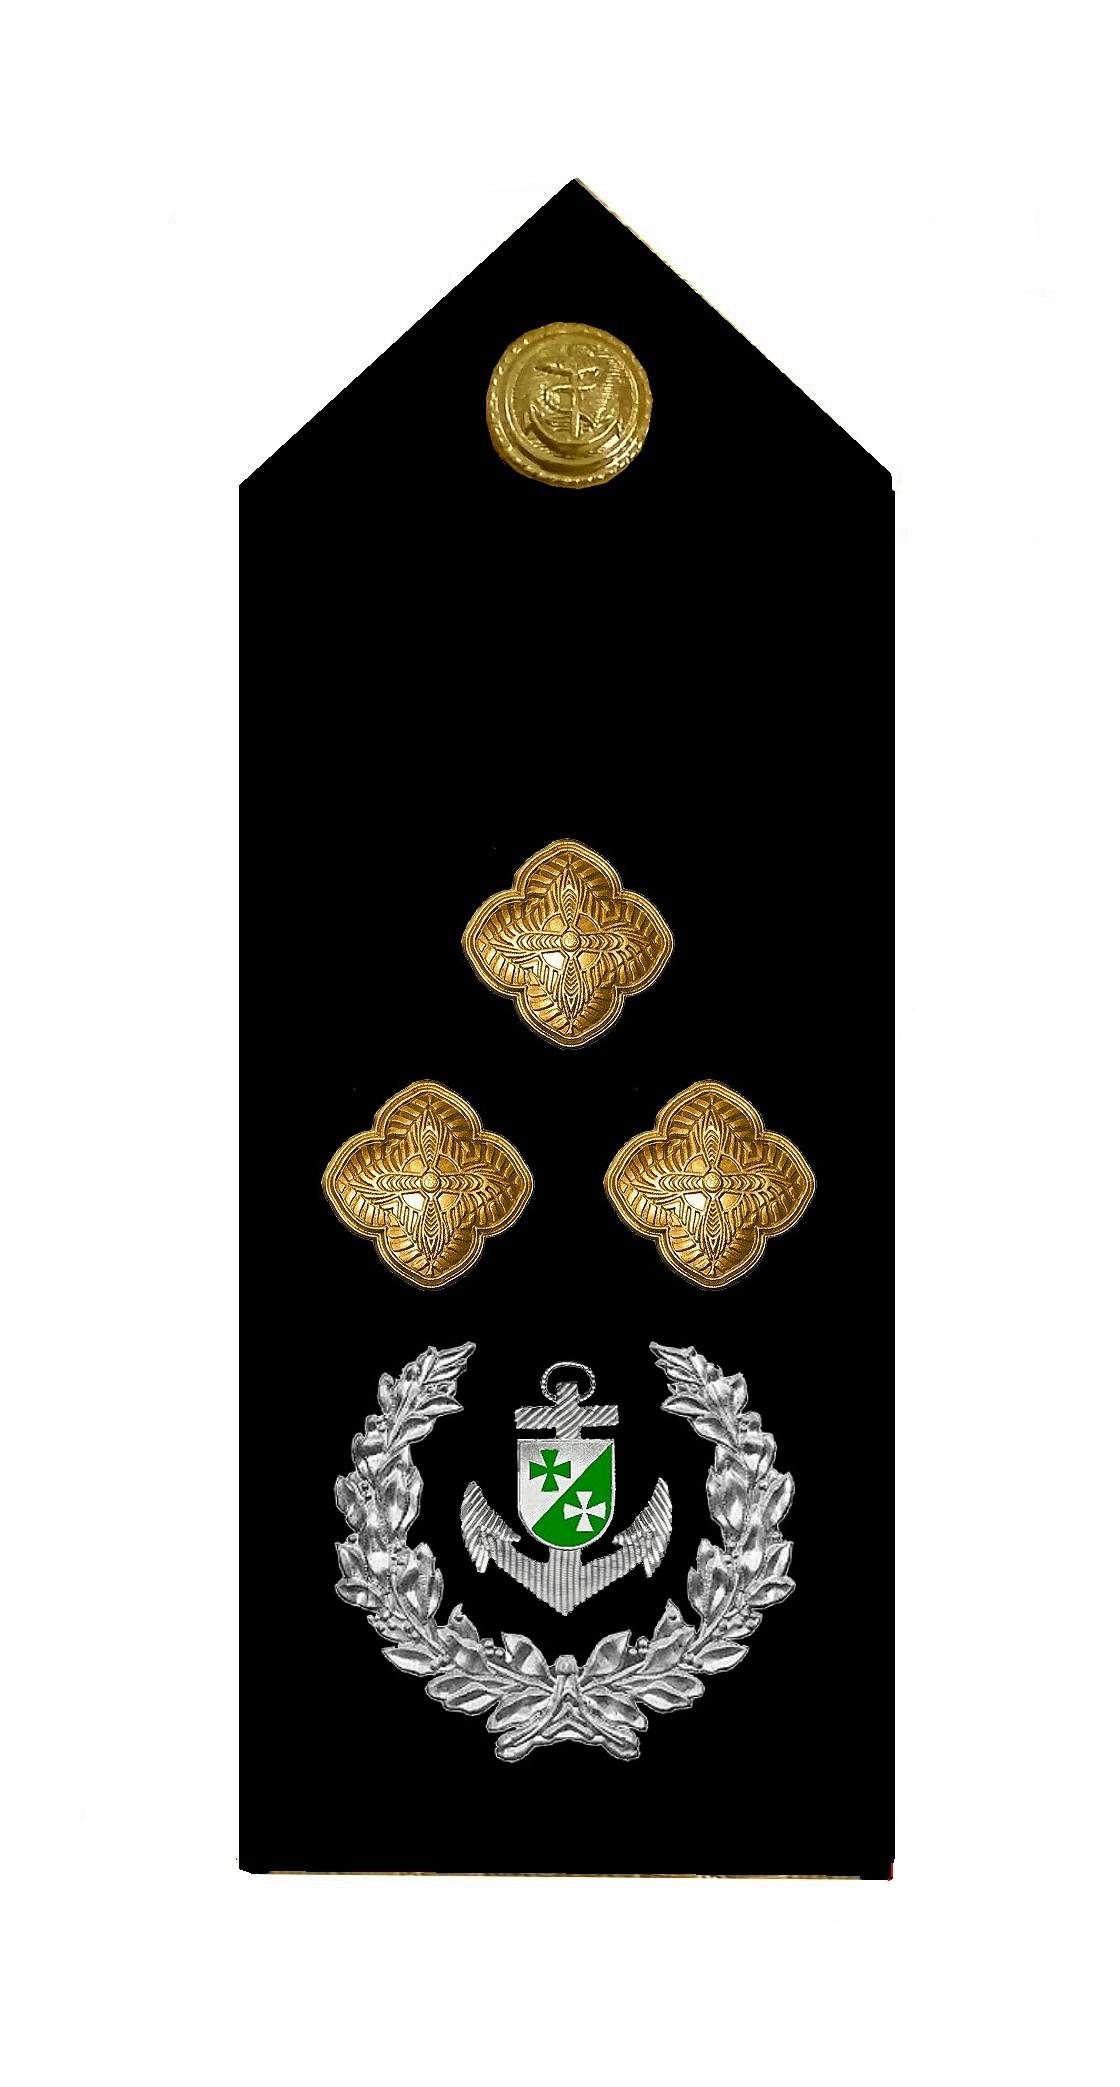 Chief Master Chief Petty Officer CSLI NC